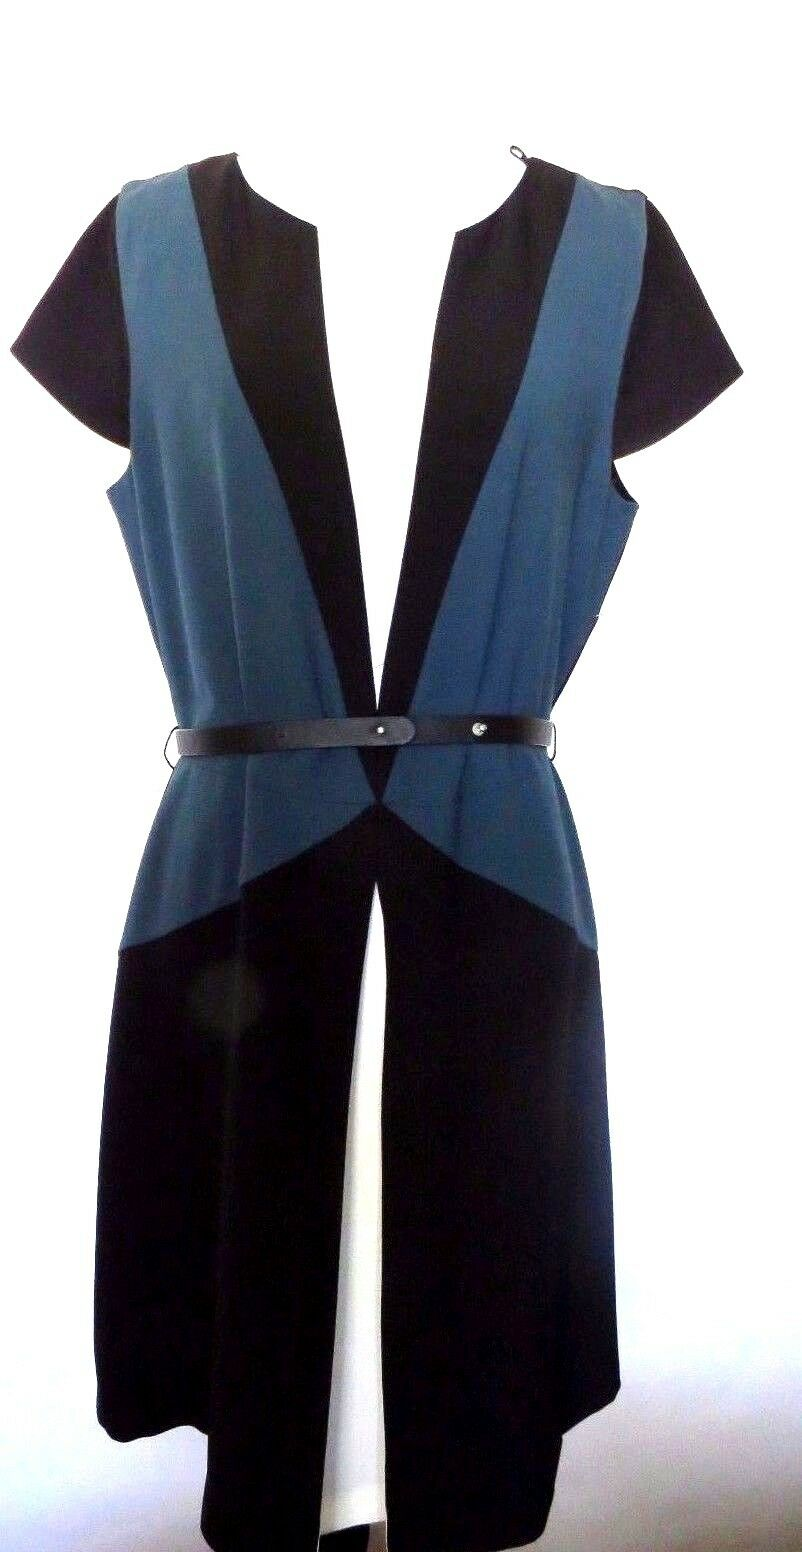 Zara schwarz Blau Weiß Farbe Solid  Farbe Block  Style  Sheath  Dress  Größe   L